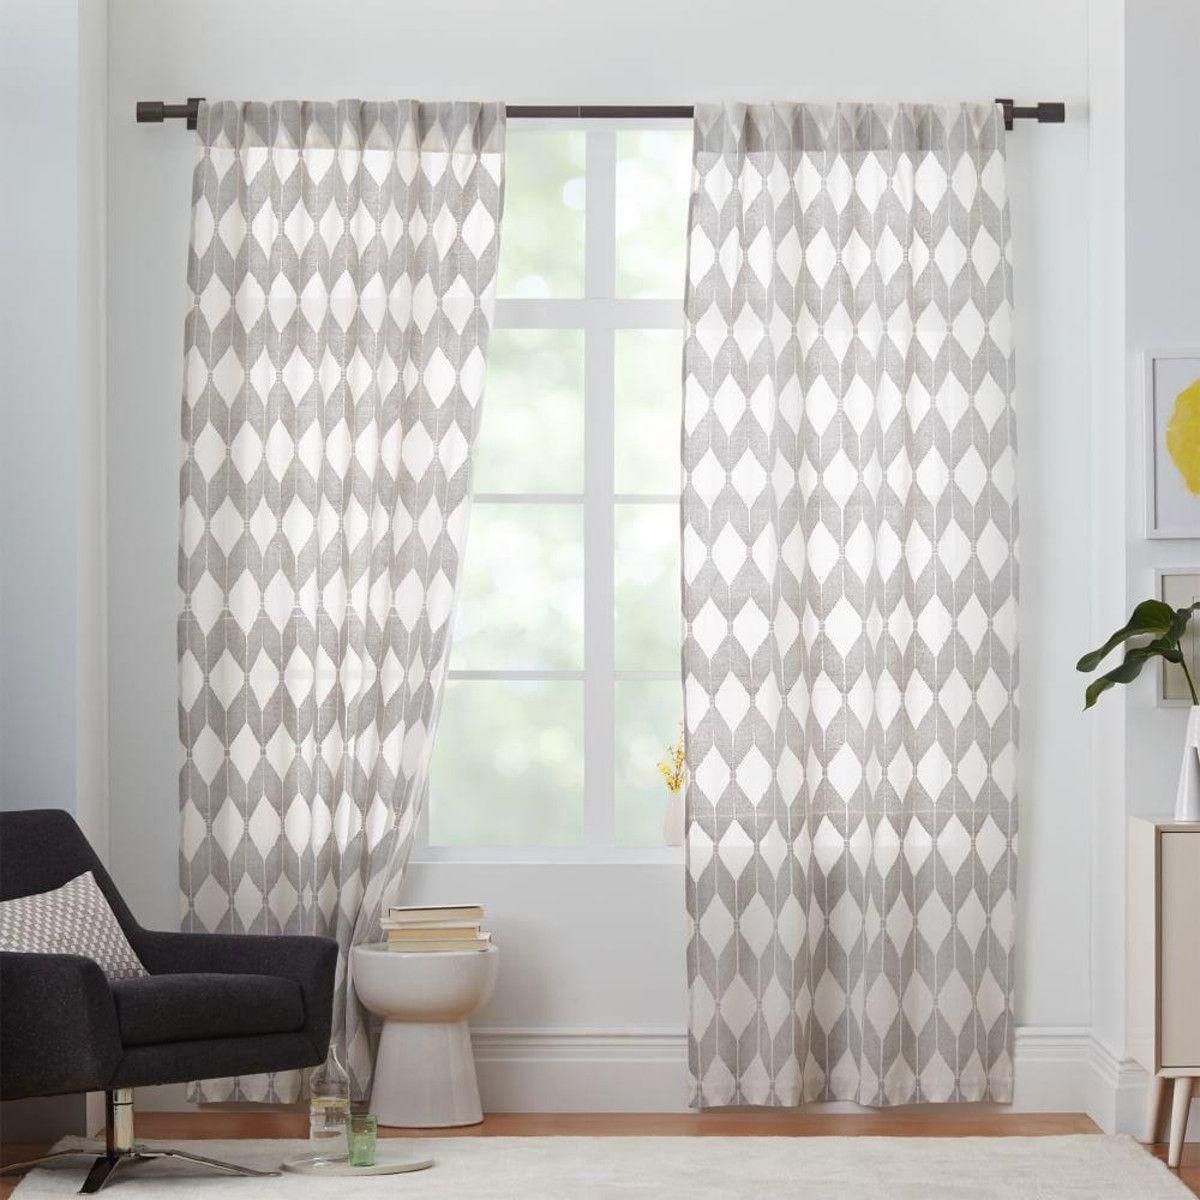 Sheer Diamond Curtain - Pewter | Dining room | Pinterest | Pewter ...